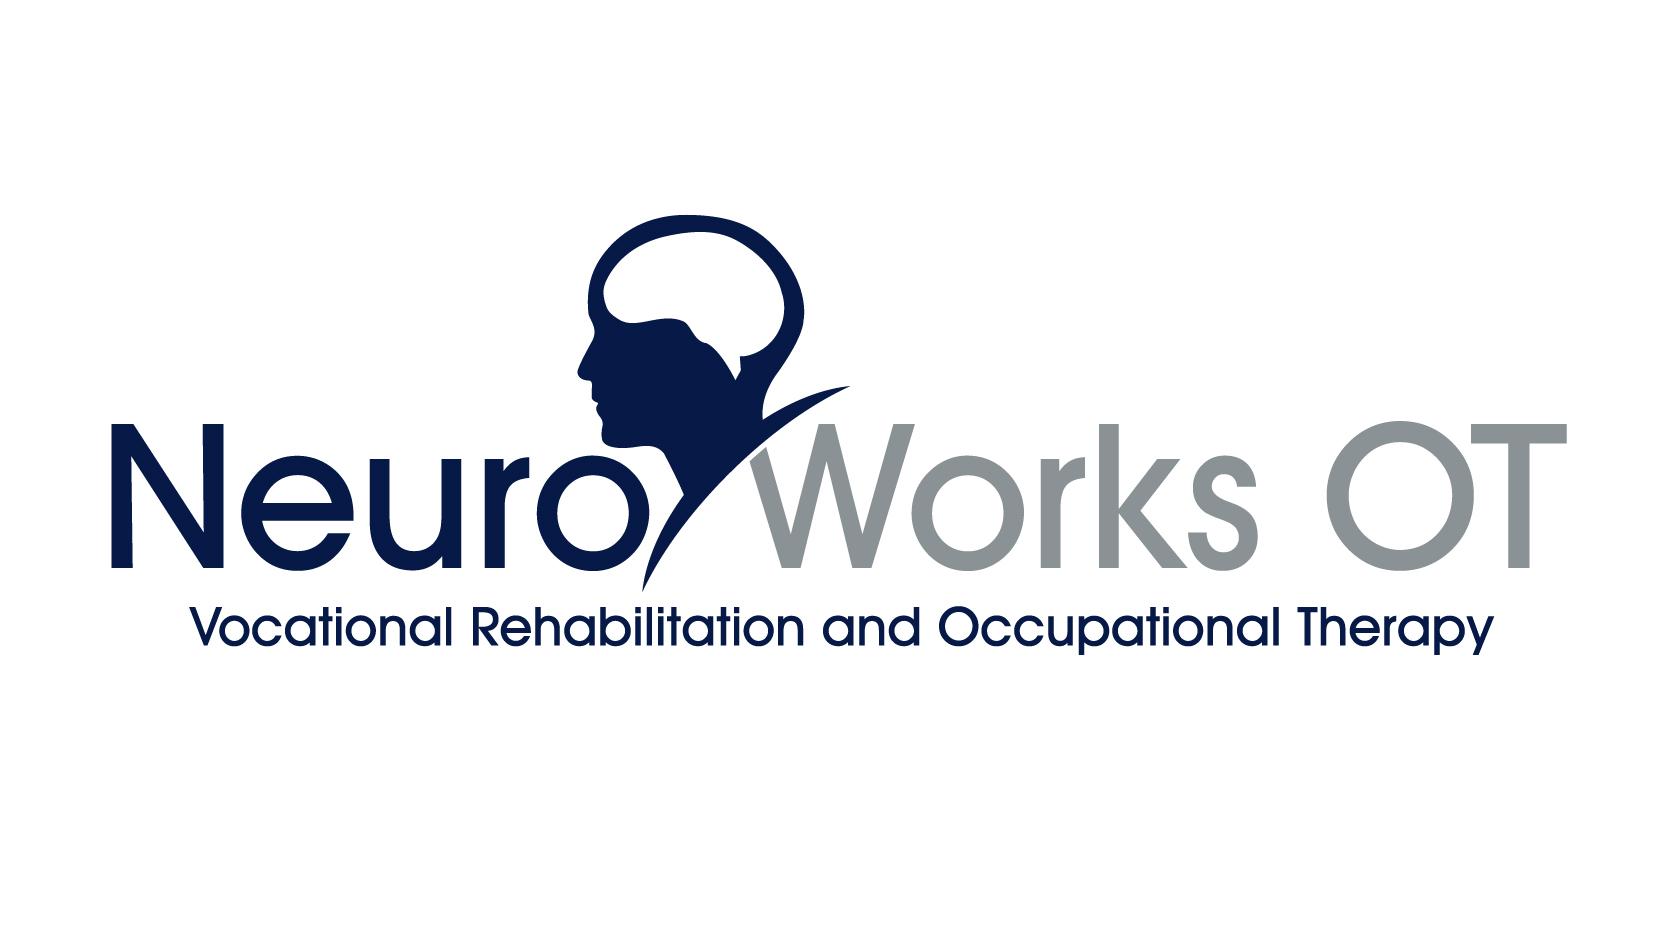 NeuroWorks OT Ltd